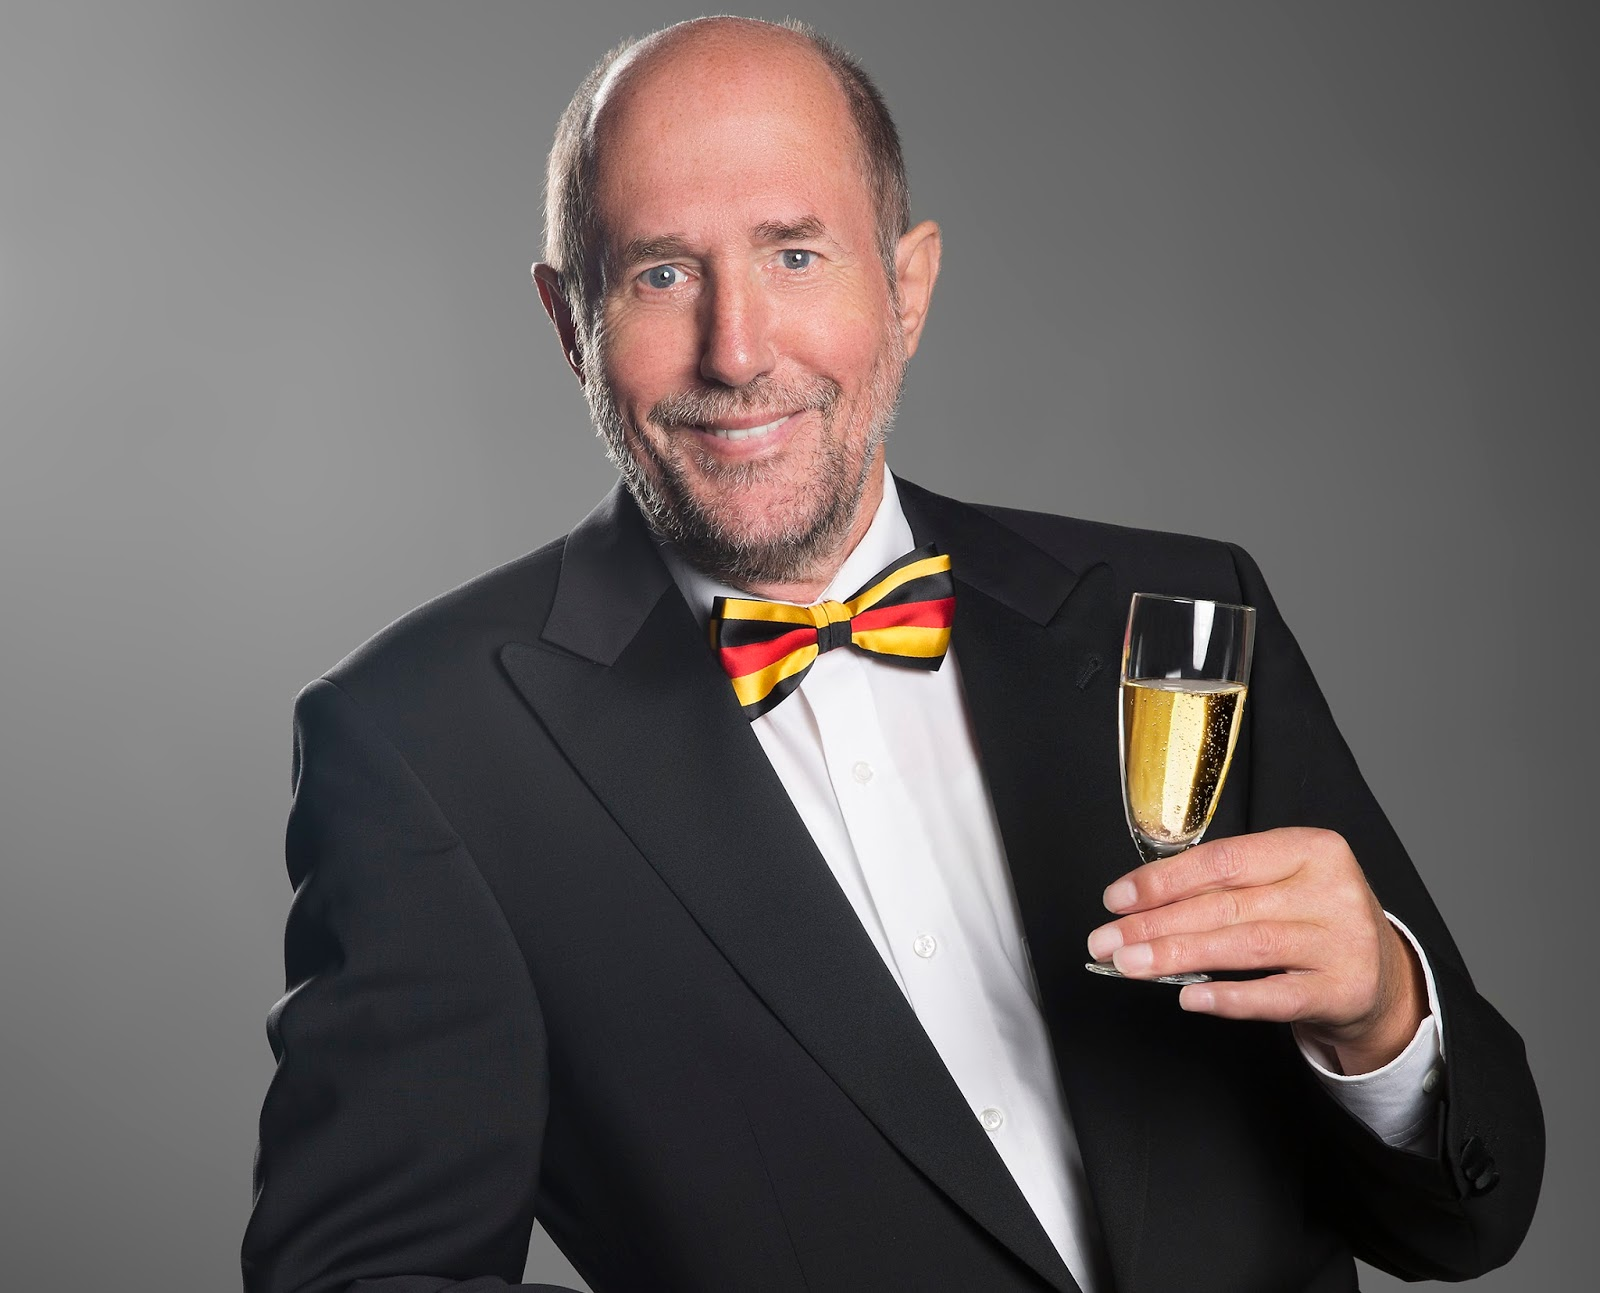 Kabarettist Mike Jörg